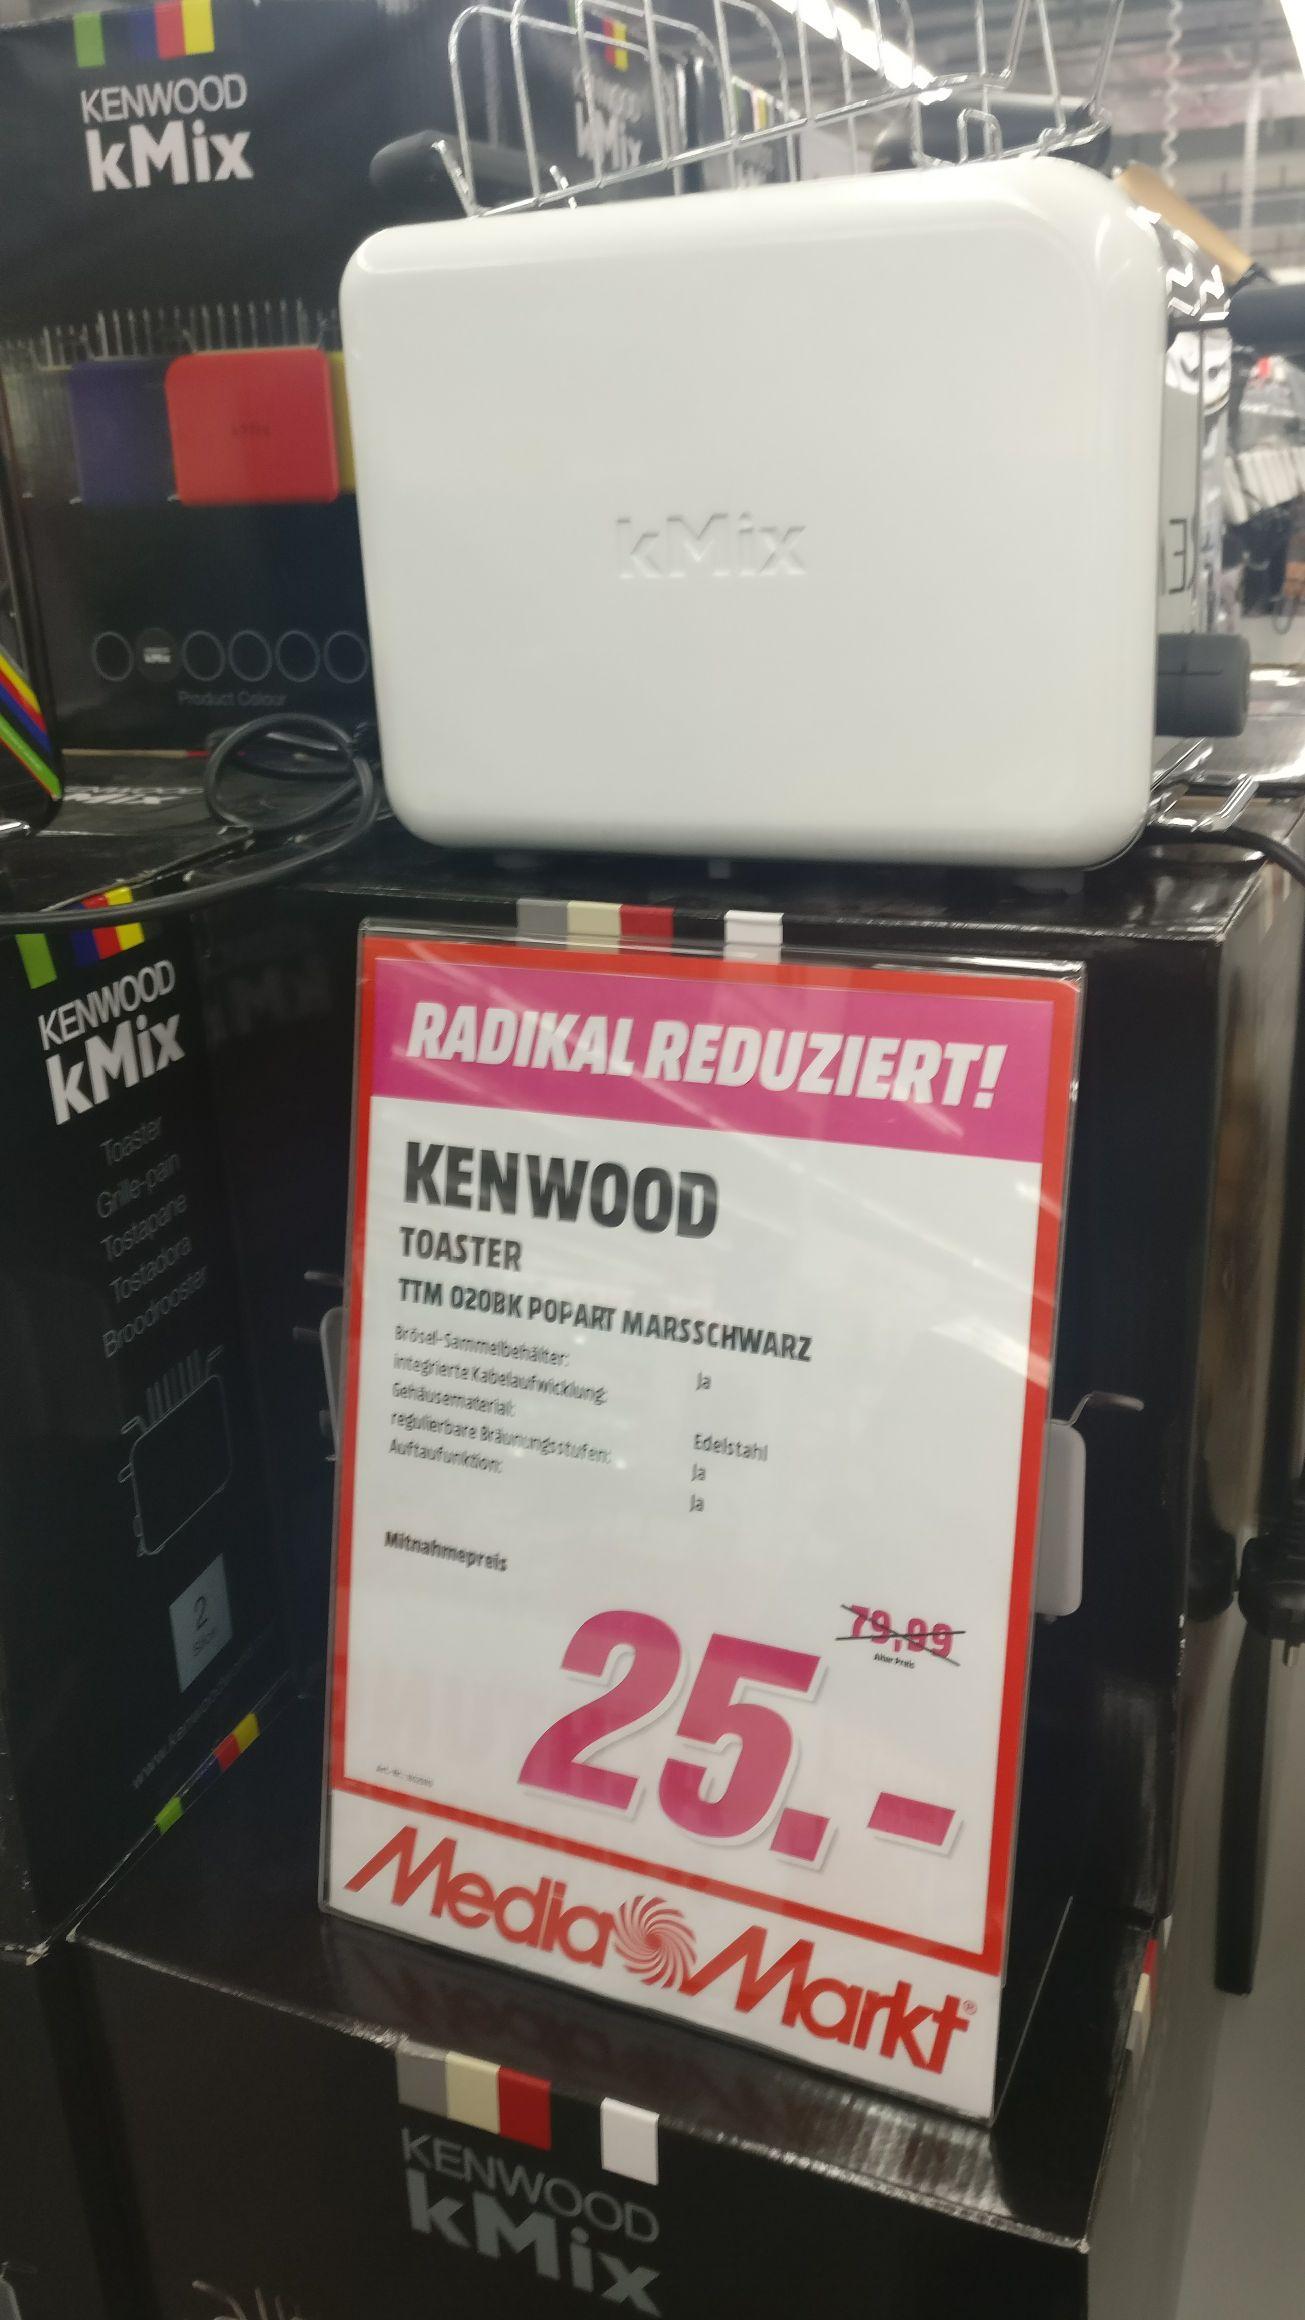 Kenwood TTM 020 Kmix Toaster zum Top Preis!Düsseldorf Bilker Acarden.